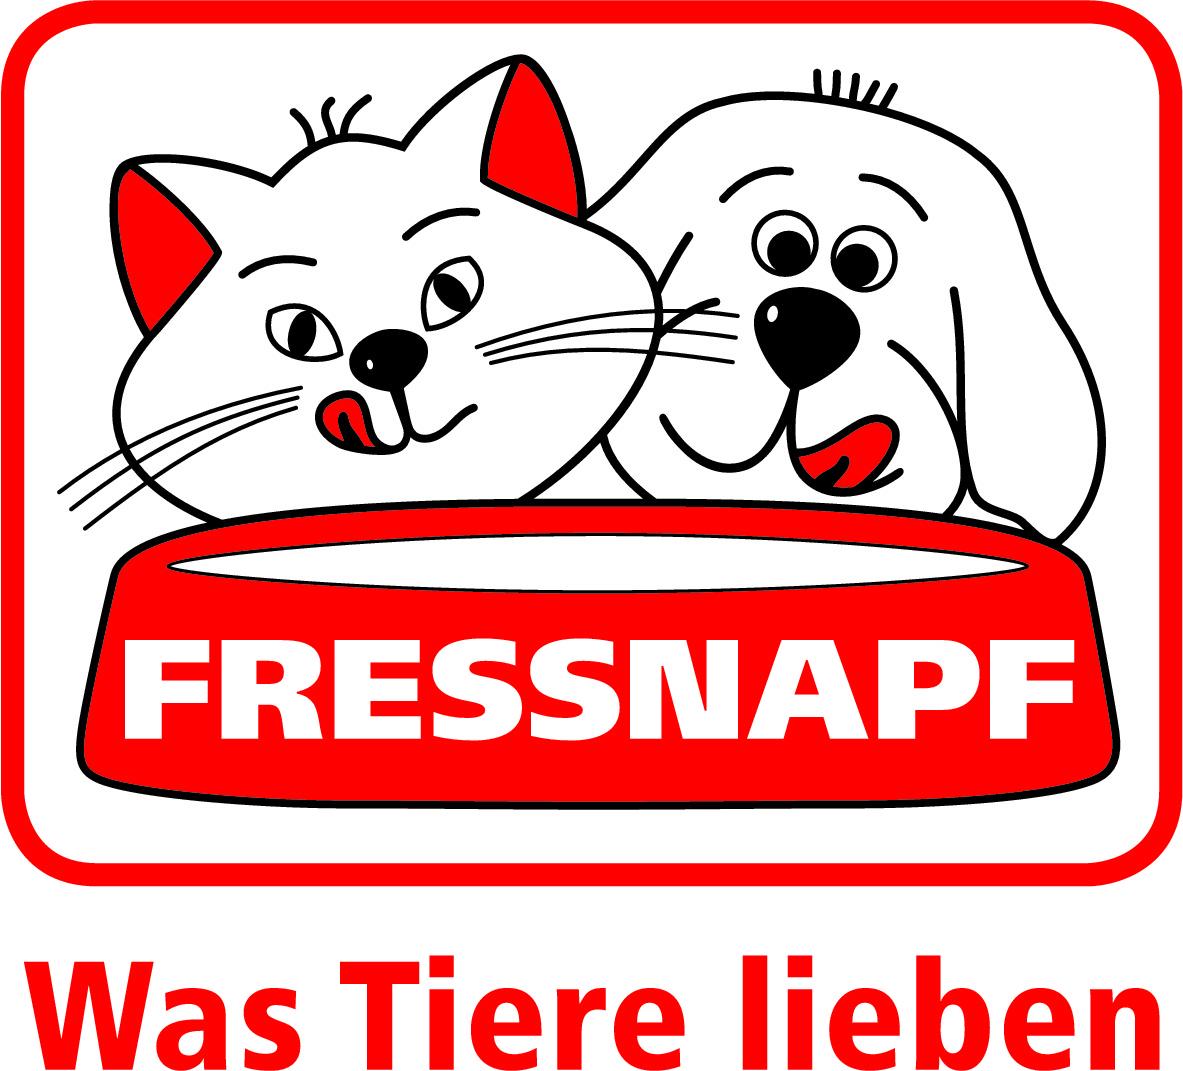 Fressnapf Freiberg